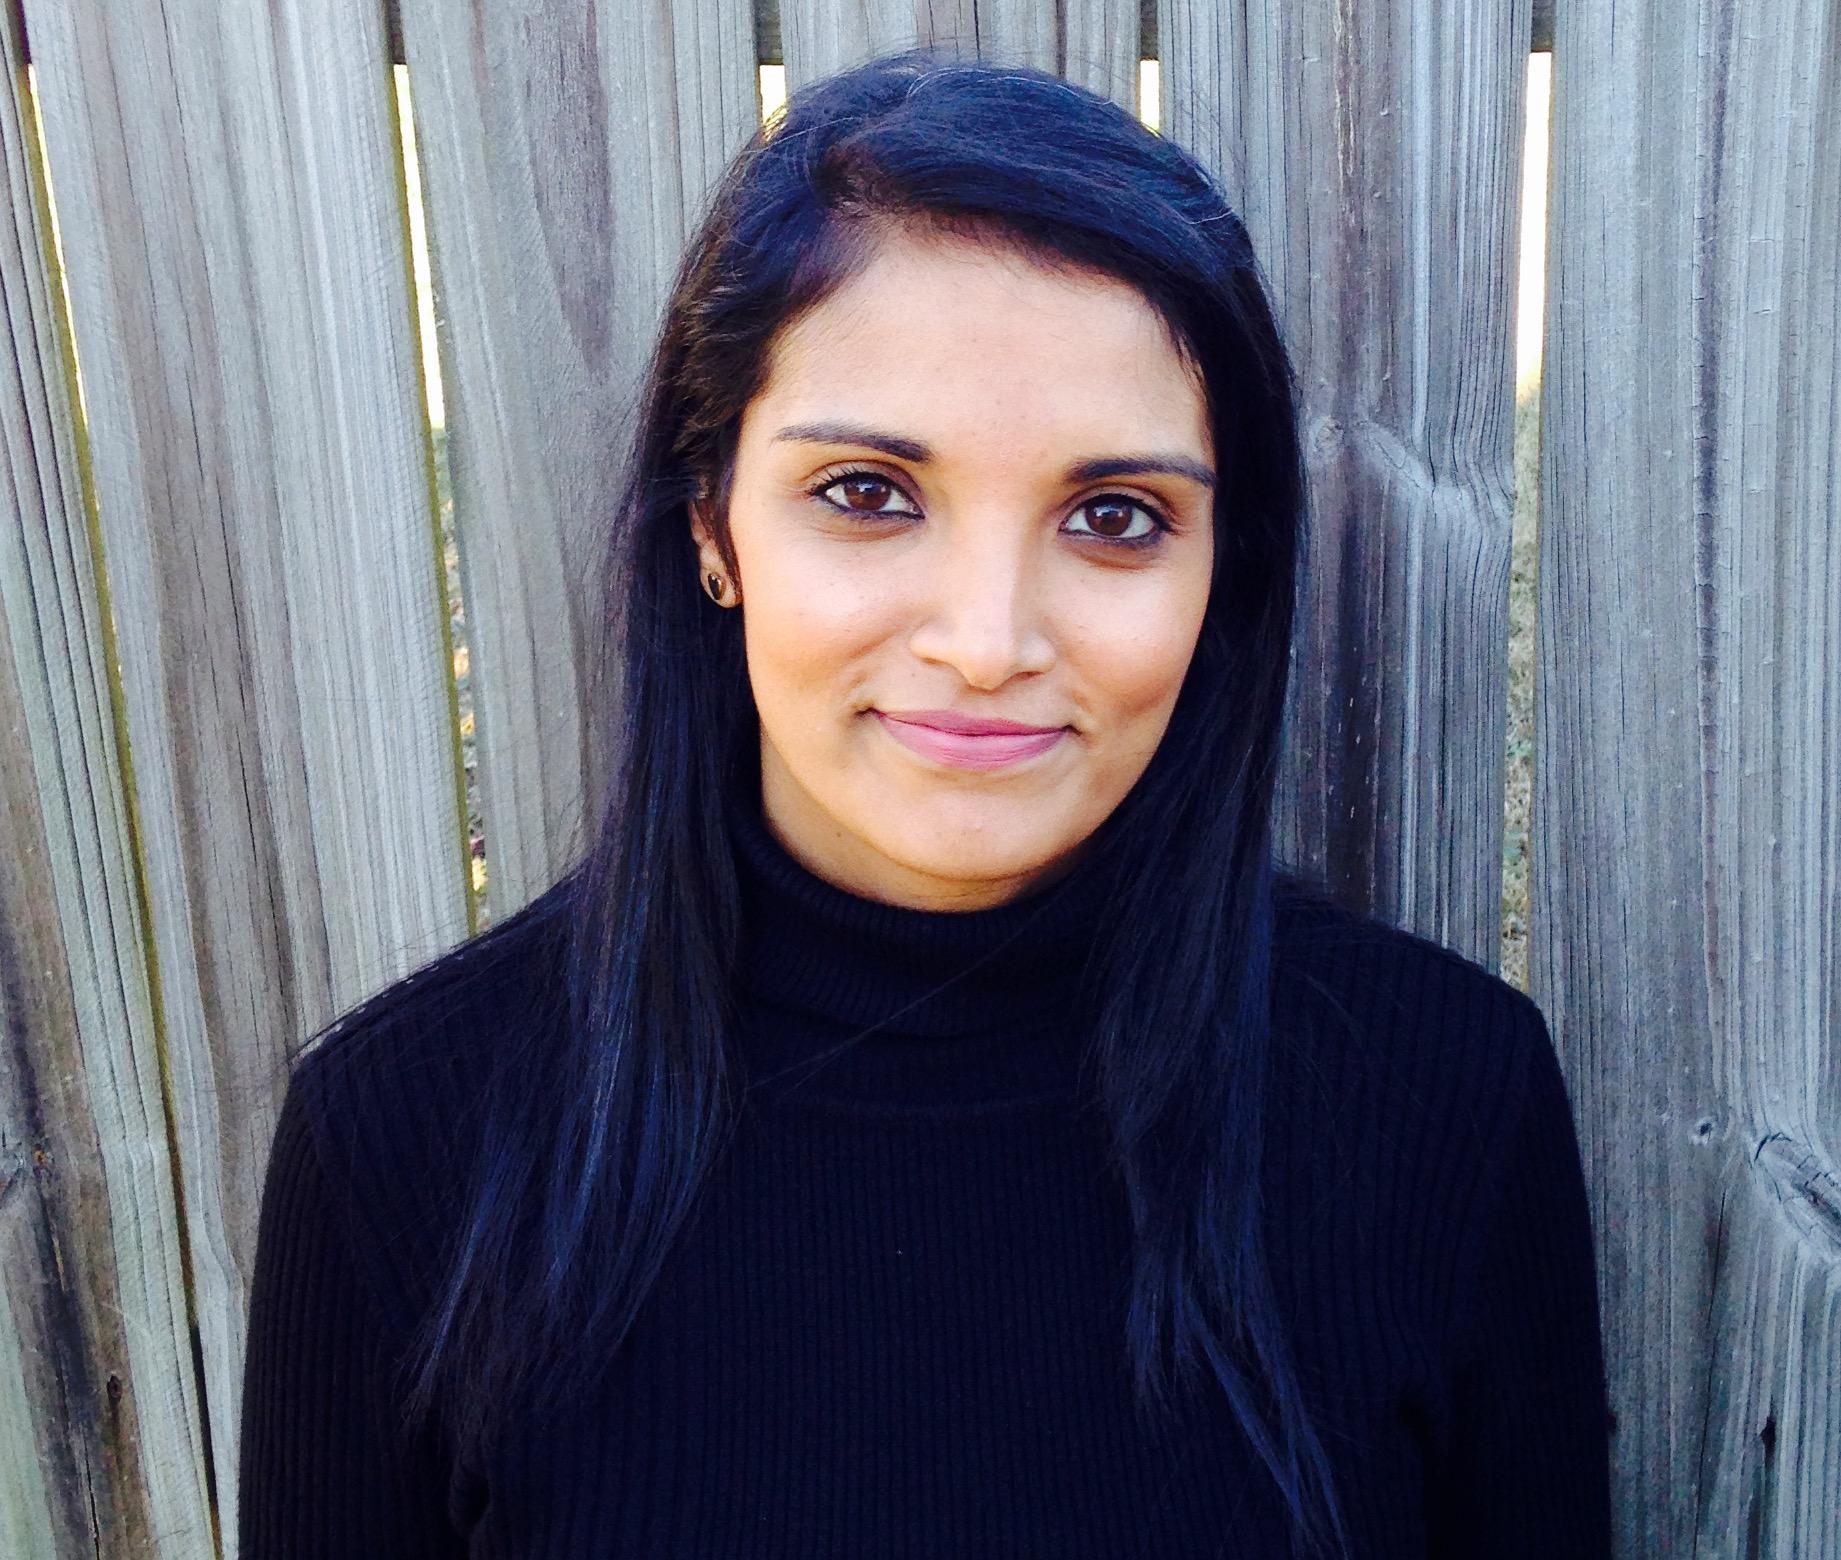 Sandhya Menon - author of When Dimple met Rishi